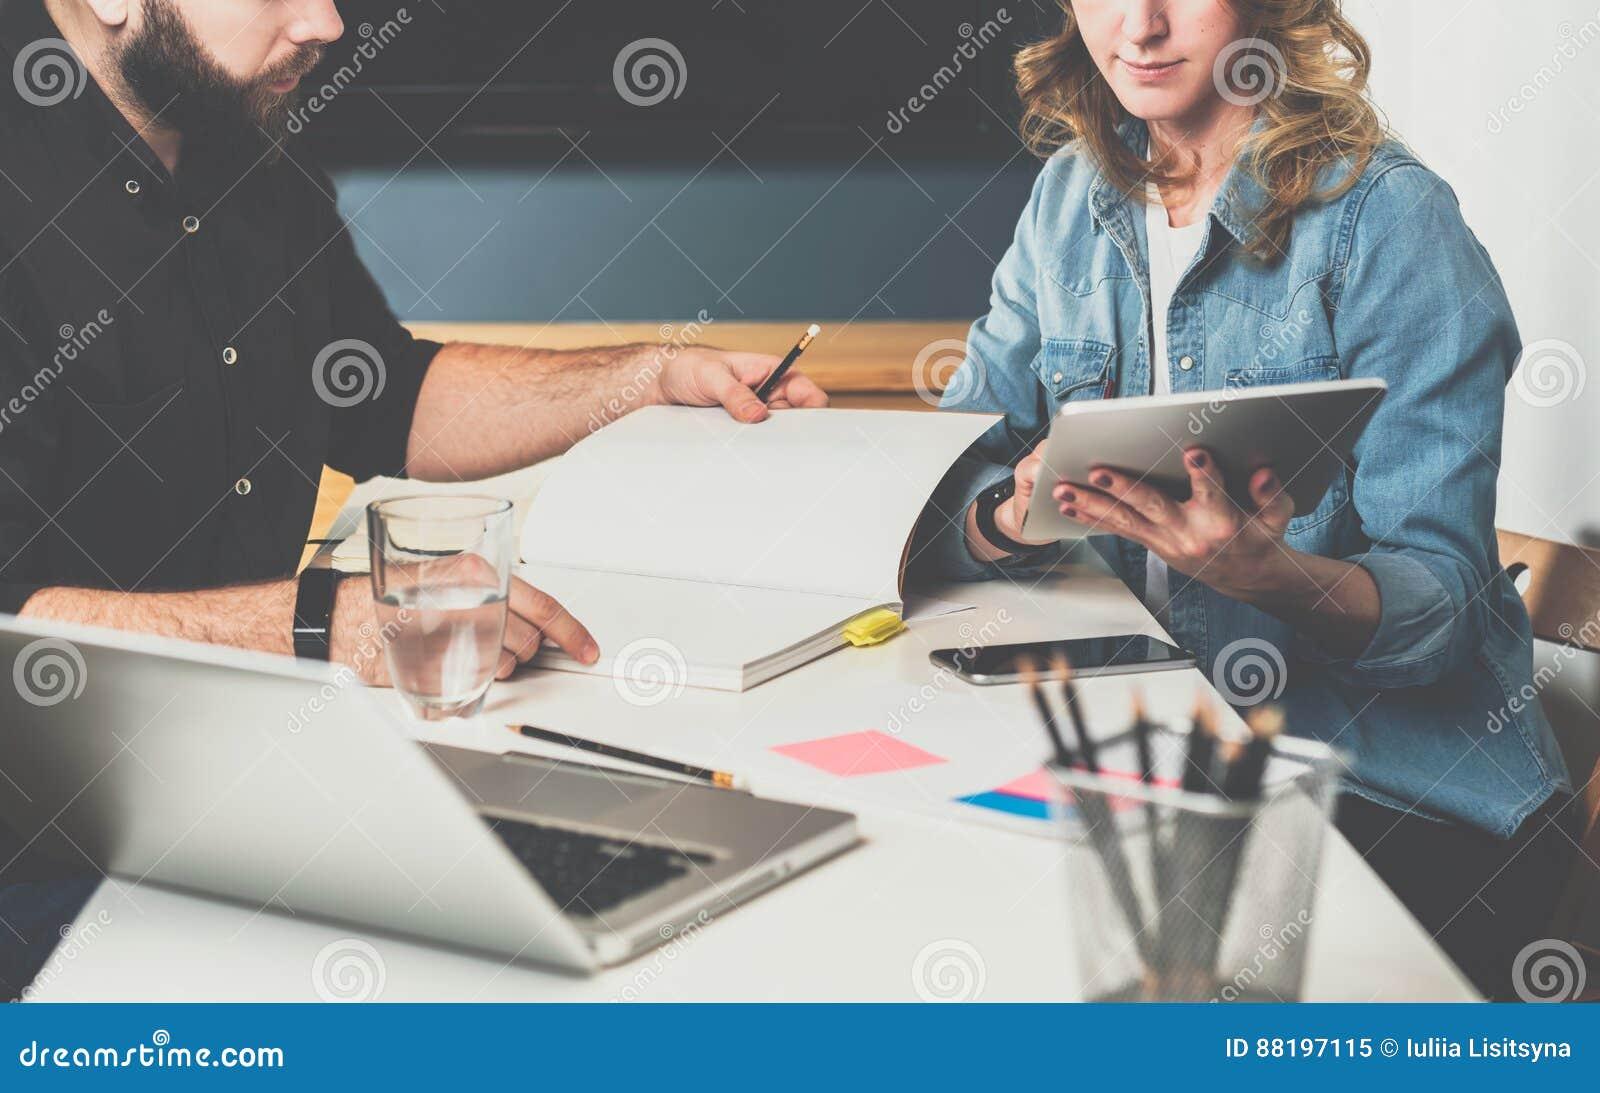 a man and woman meet at card table